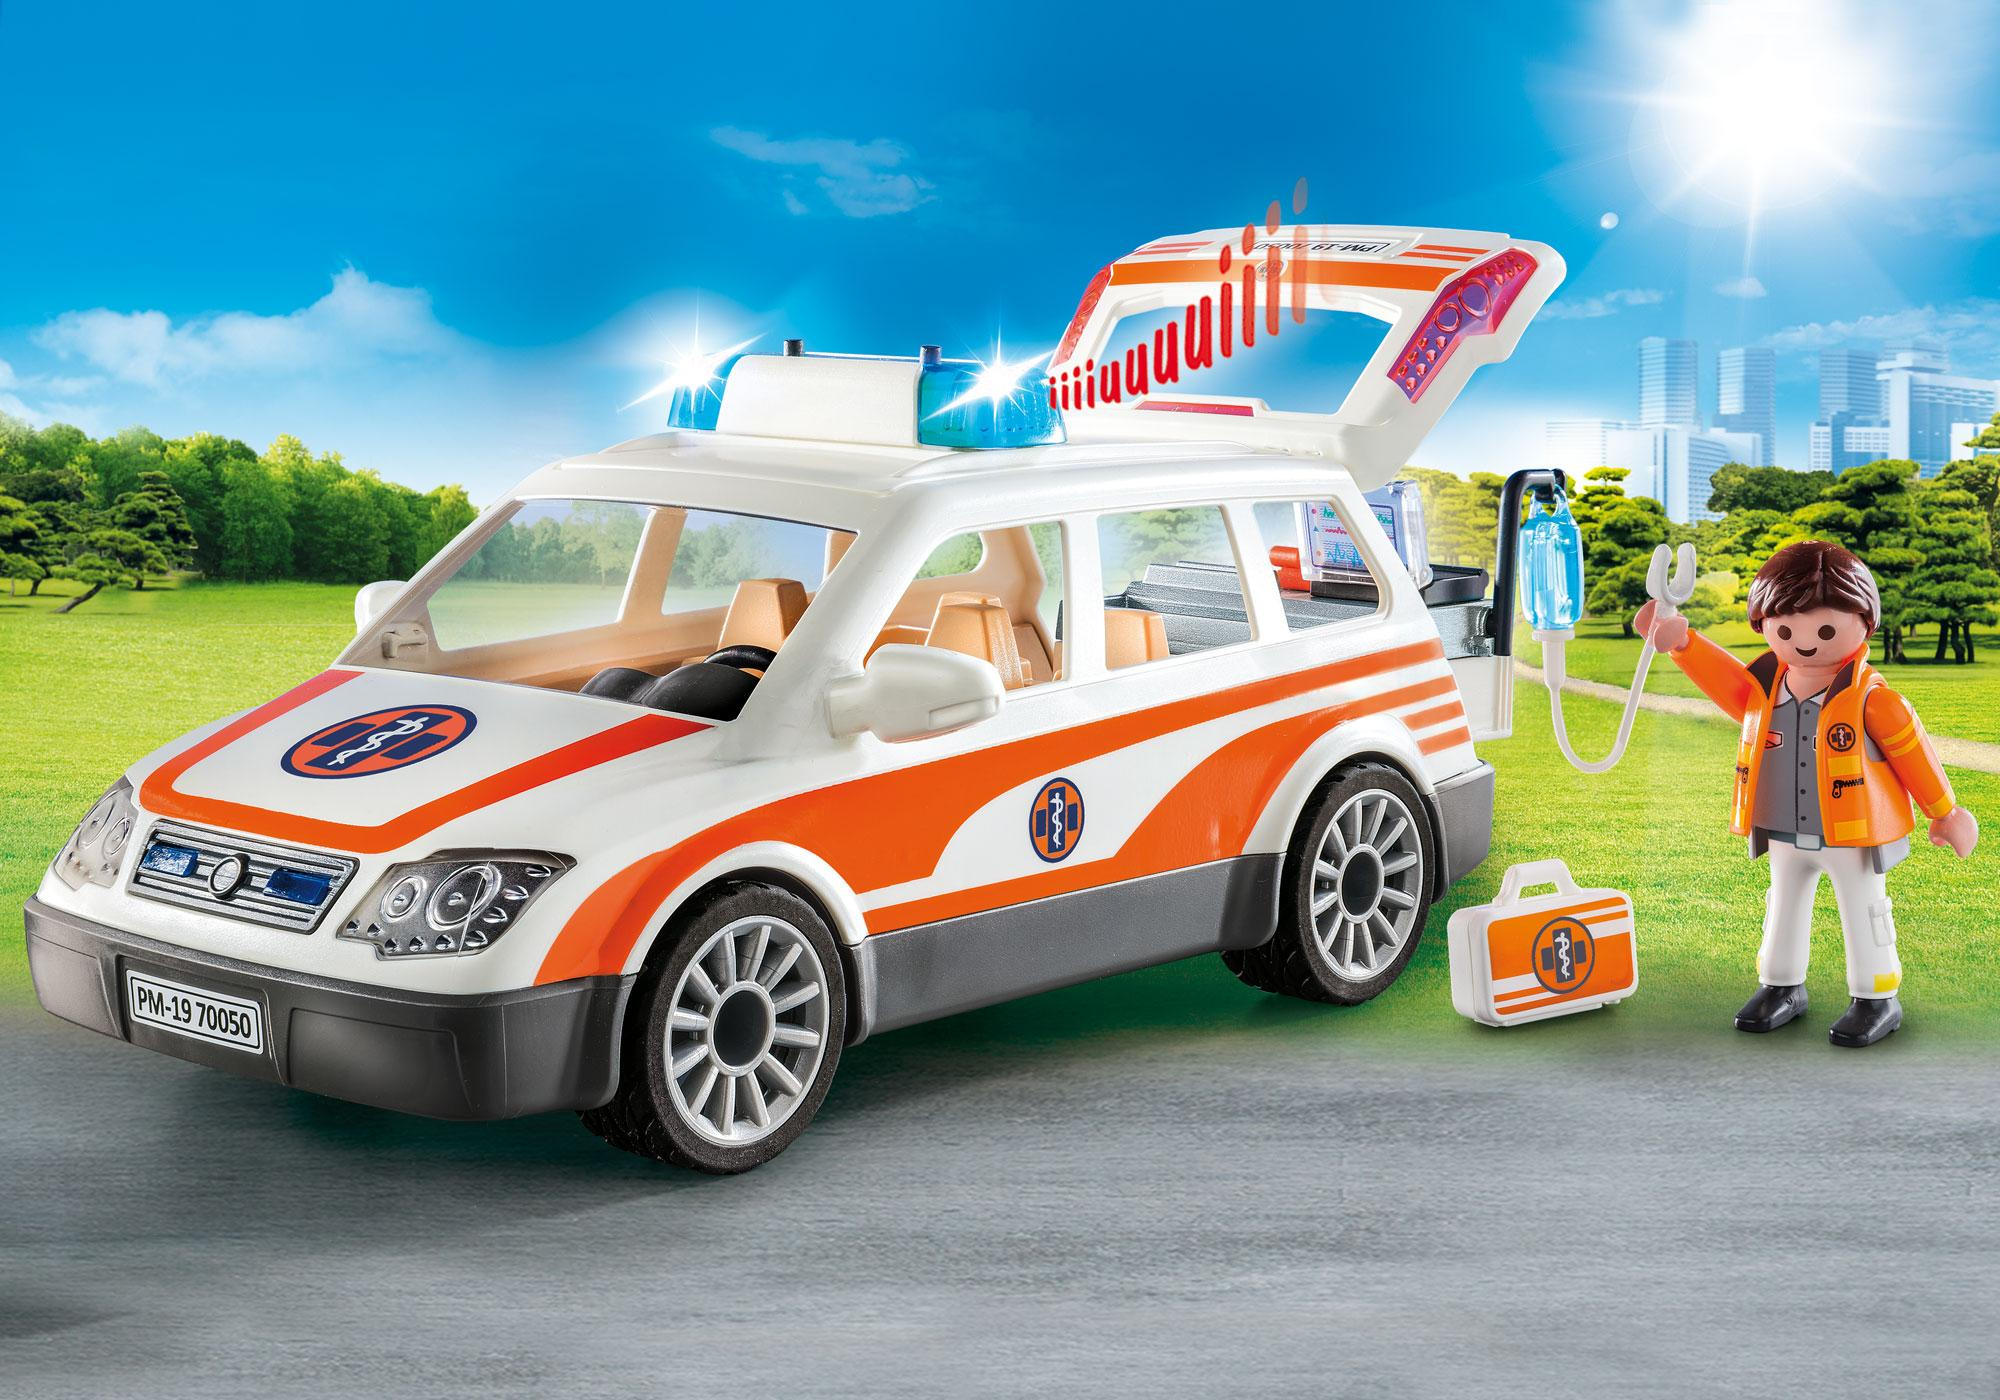 http://media.playmobil.com/i/playmobil/70050_product_detail/Automedica con sirena